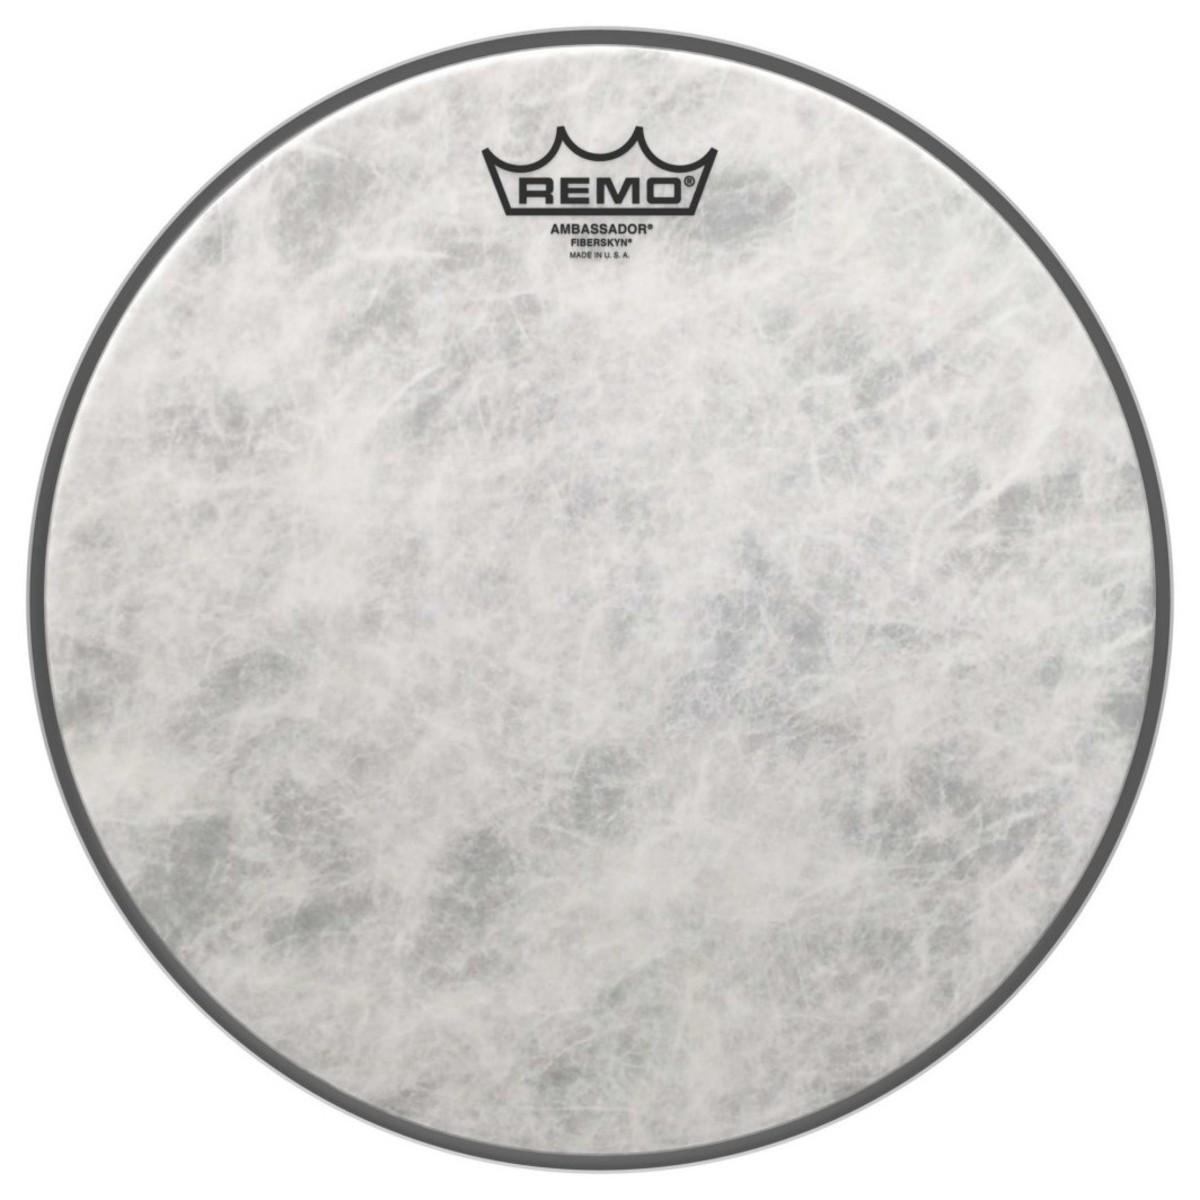 Remo Ambassador Fiberskyn 3 13 Drum Head